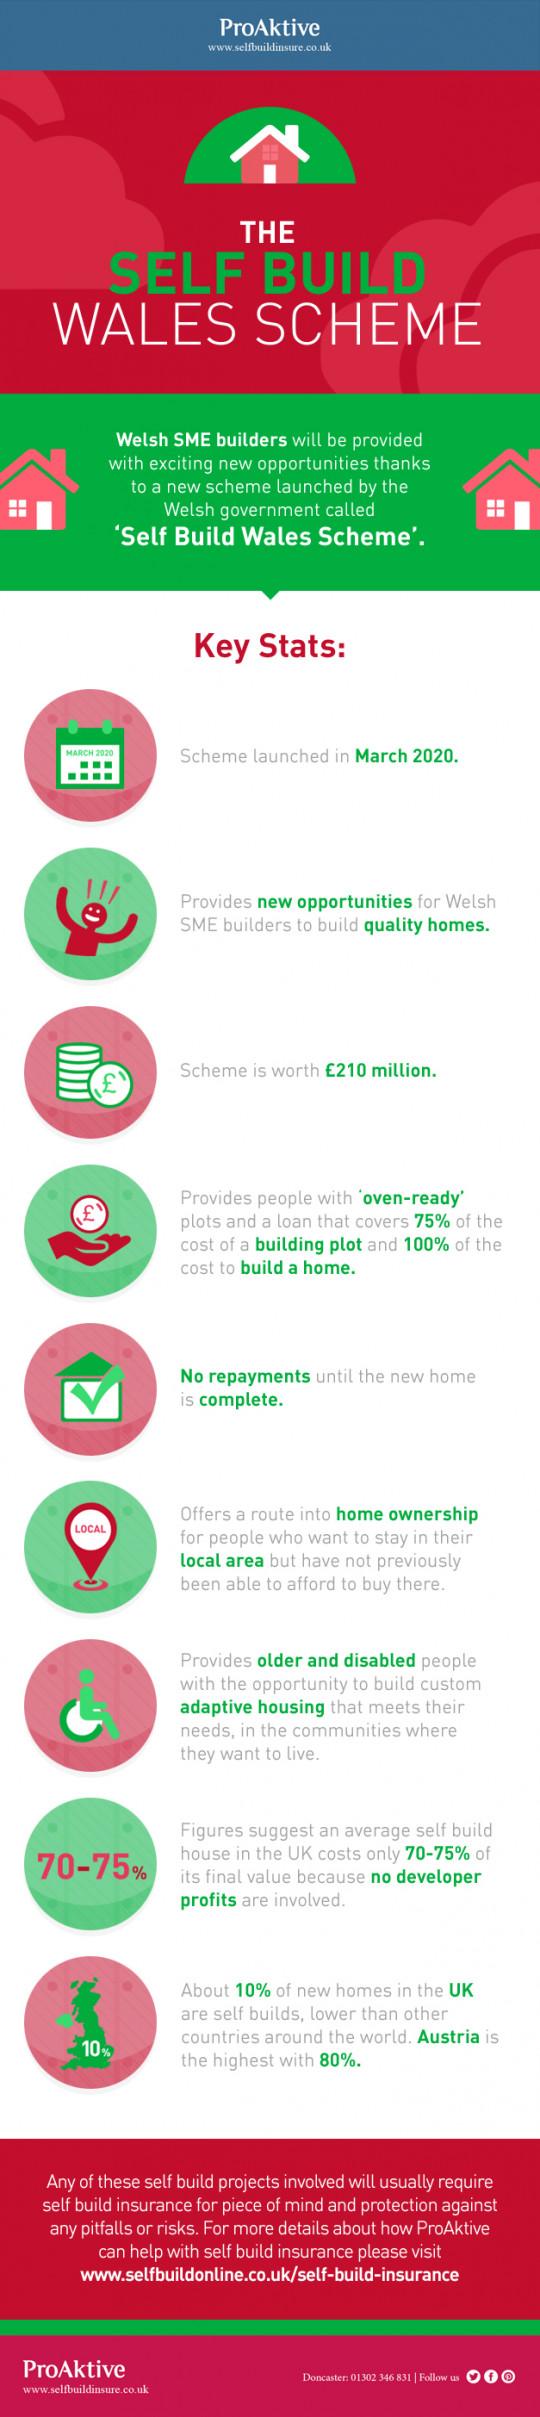 The Self Build Wales Scheme